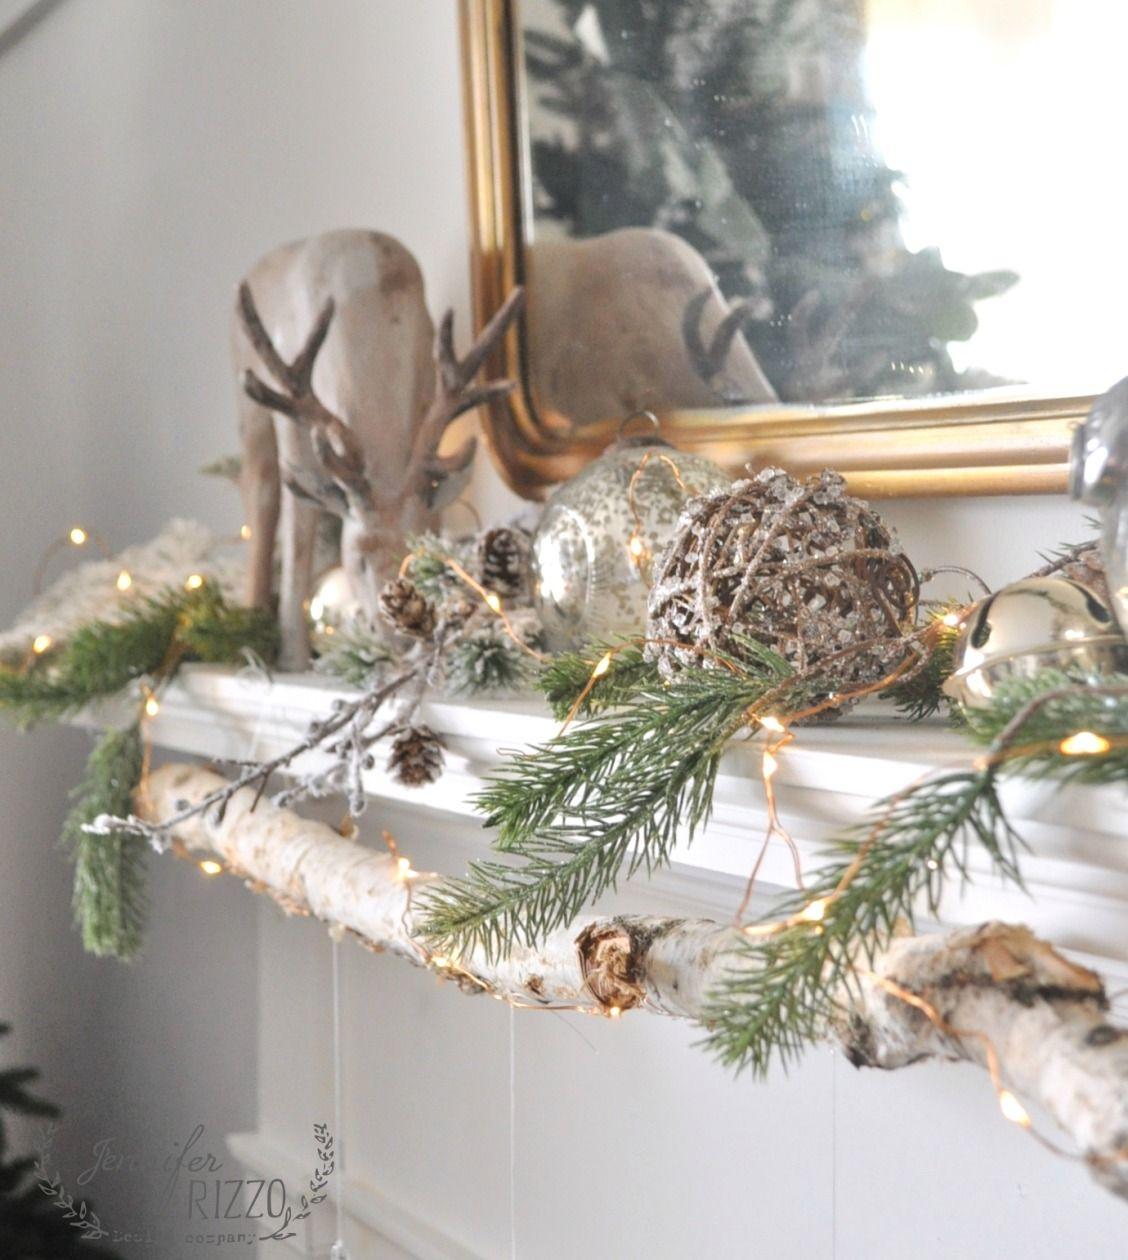 Modern rustic mantel with easy DIY glitter ornaments